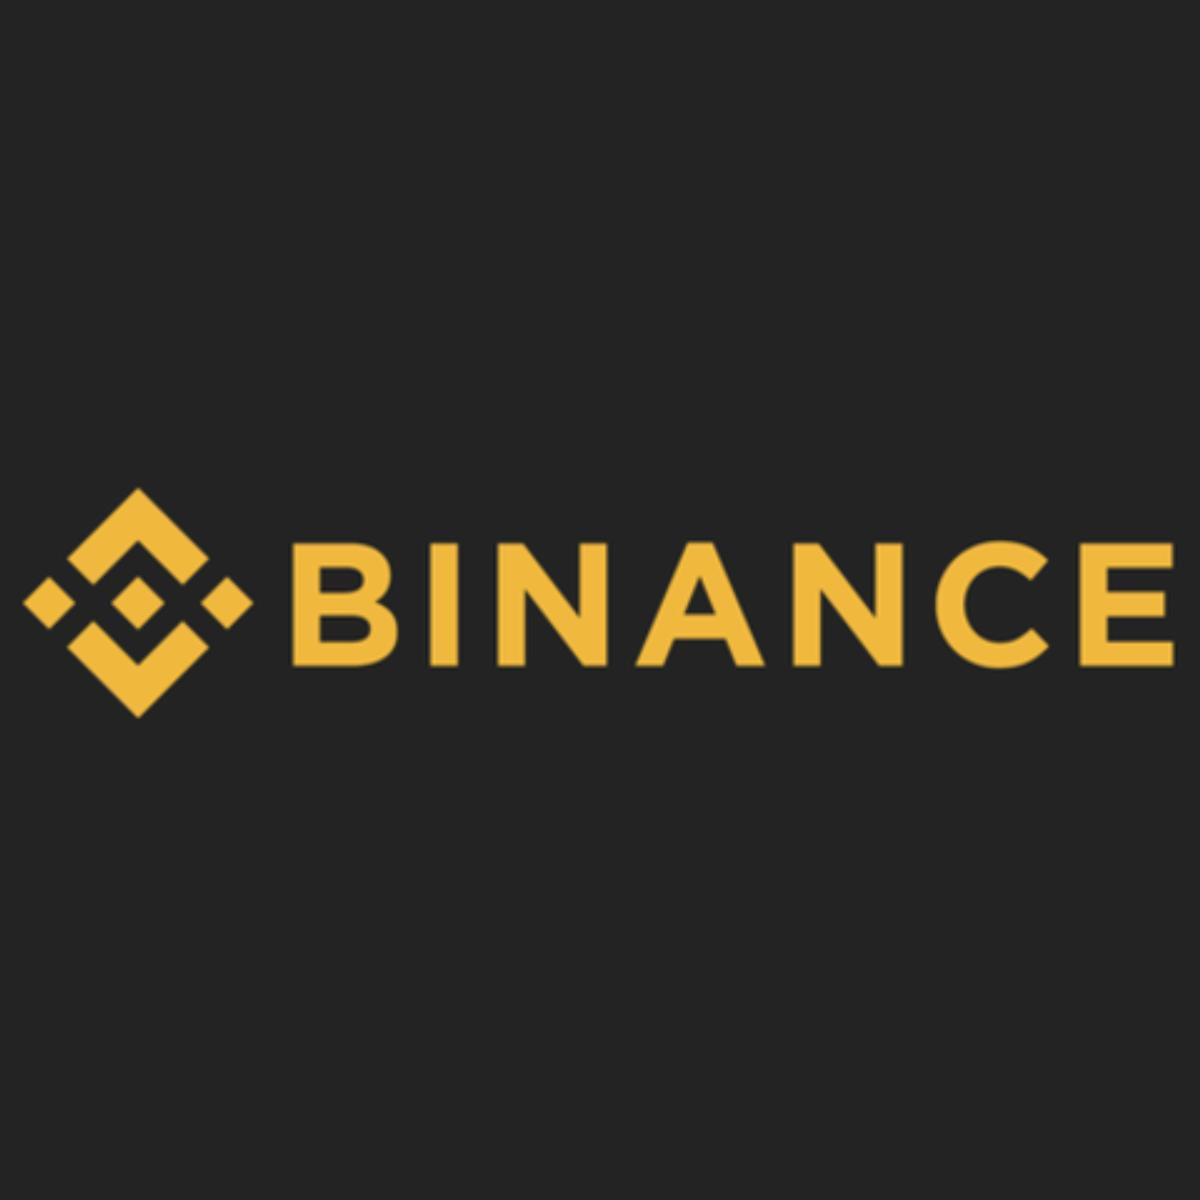 Binance(バイナンス)